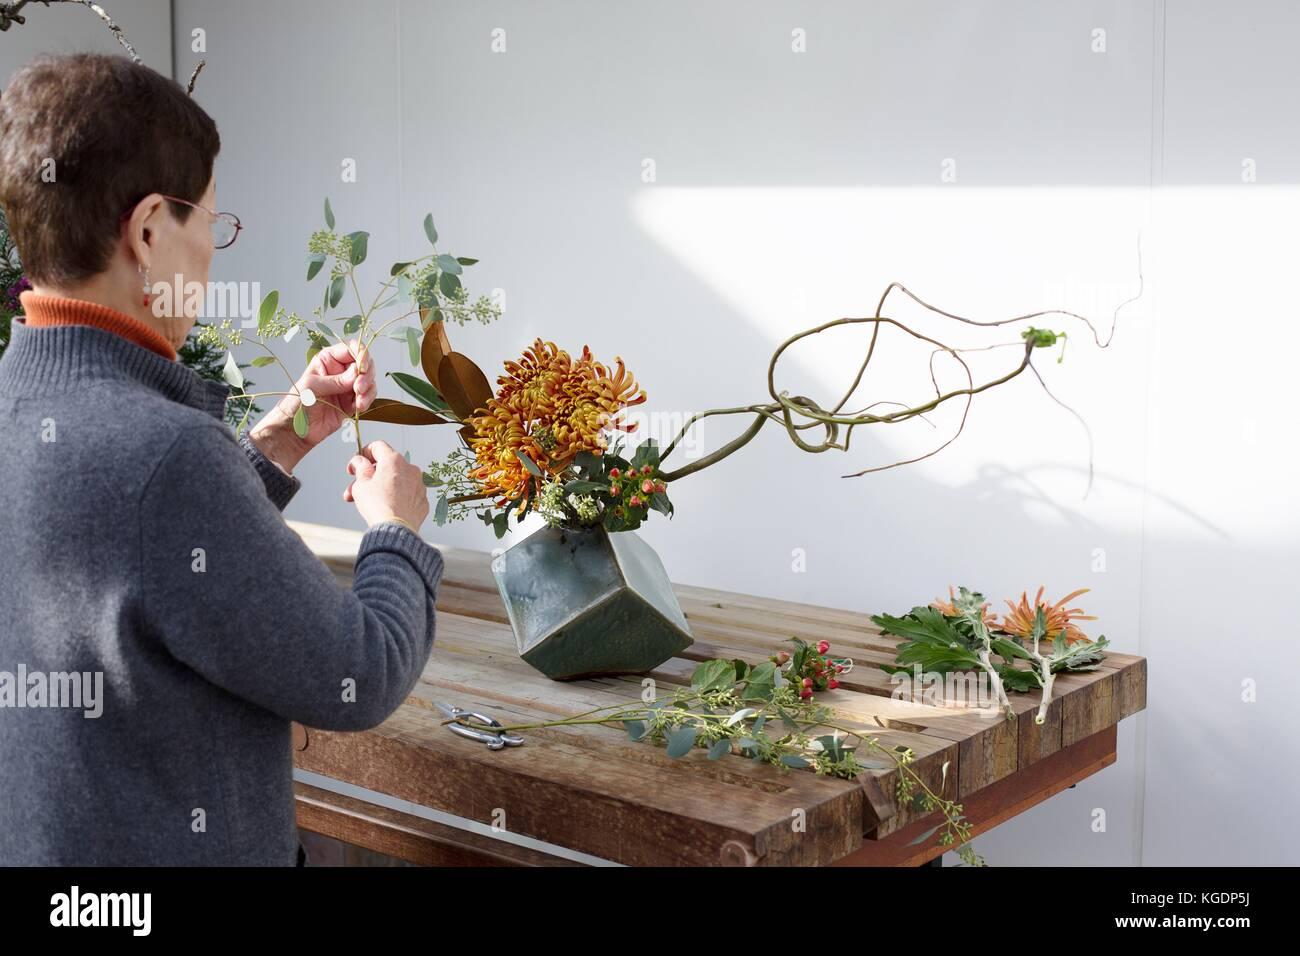 A woman creating an Ikebana flower arrangement at Como Conservatory in St. Paul, Minnesota, USA. - Stock Image